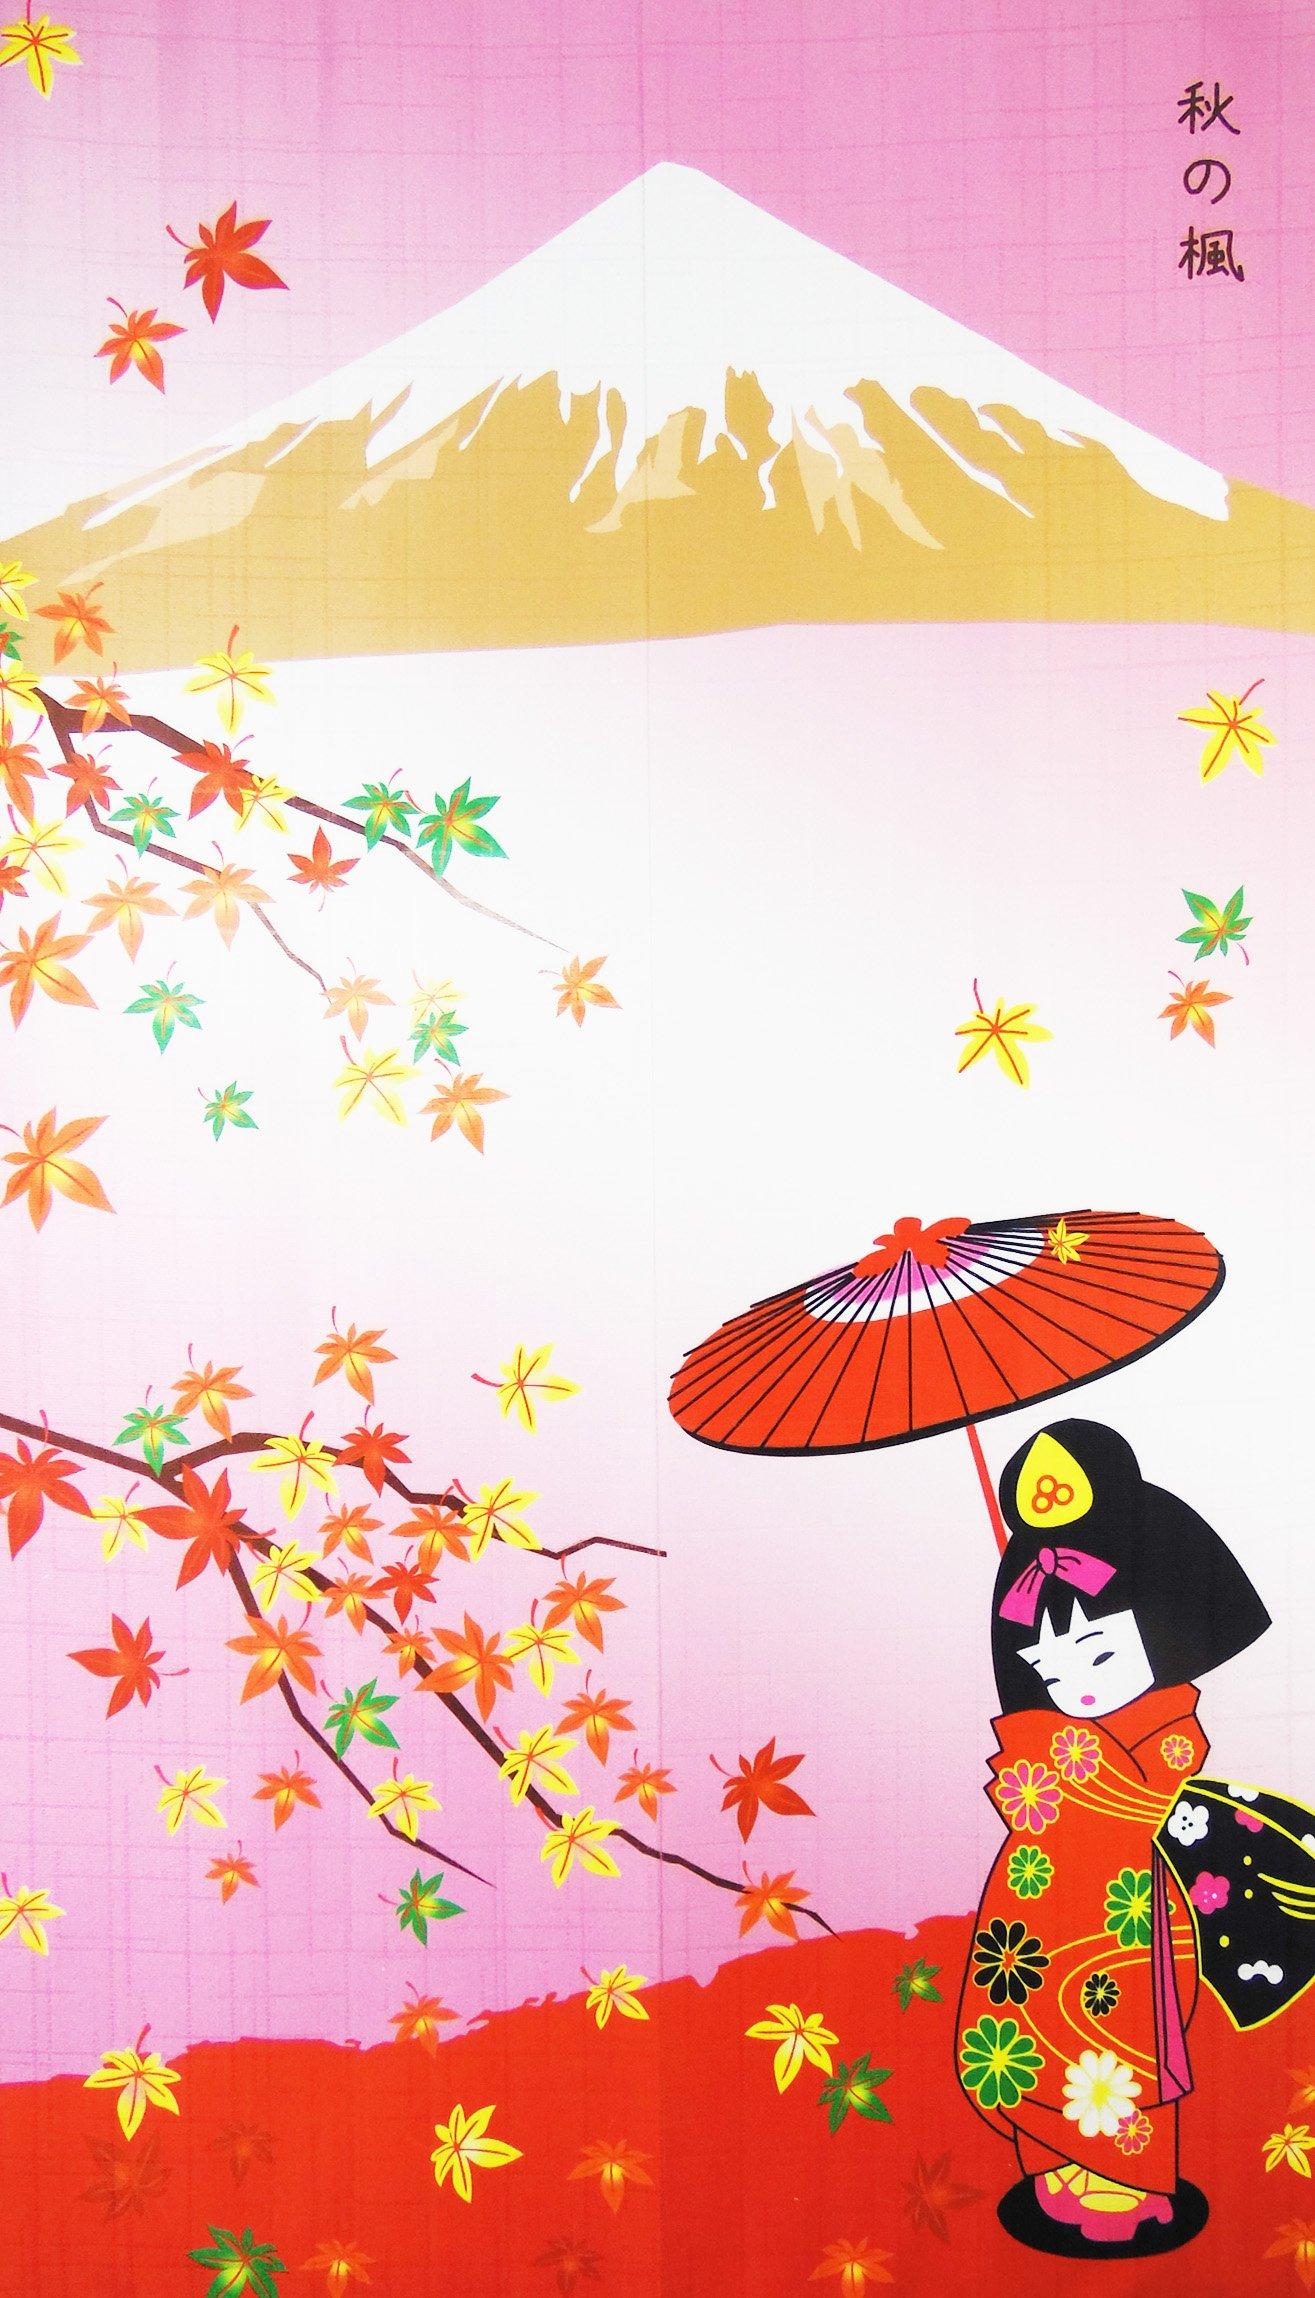 Kawaii Girl Maple-leaf Romantic Fall Landscape Pattern Door Curtain Japanese Noren Curtain Bedroom Curtain by LifEast